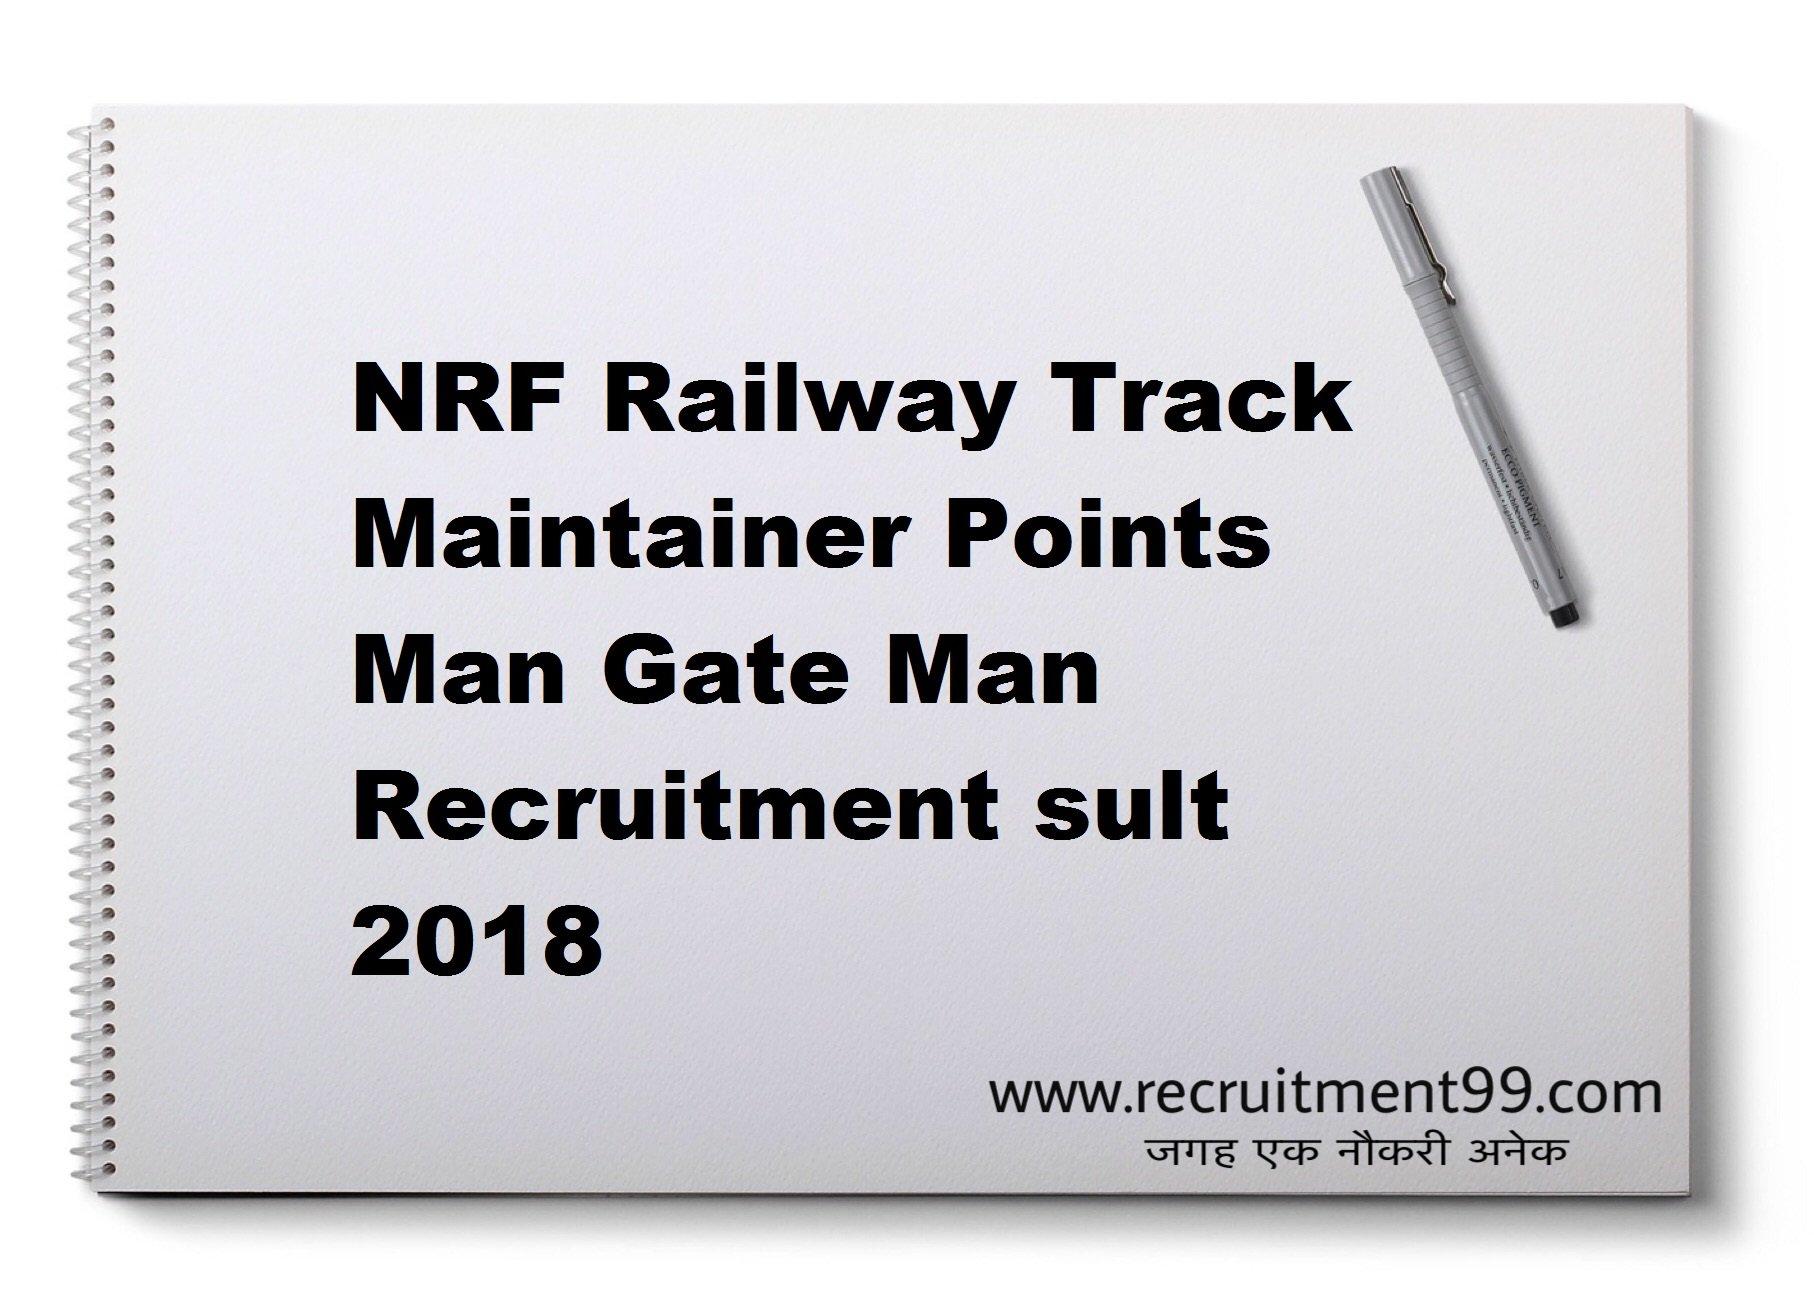 NRF Railway Track Maintainer Points Man Gate Man Recruitment Admit Card Result 2018